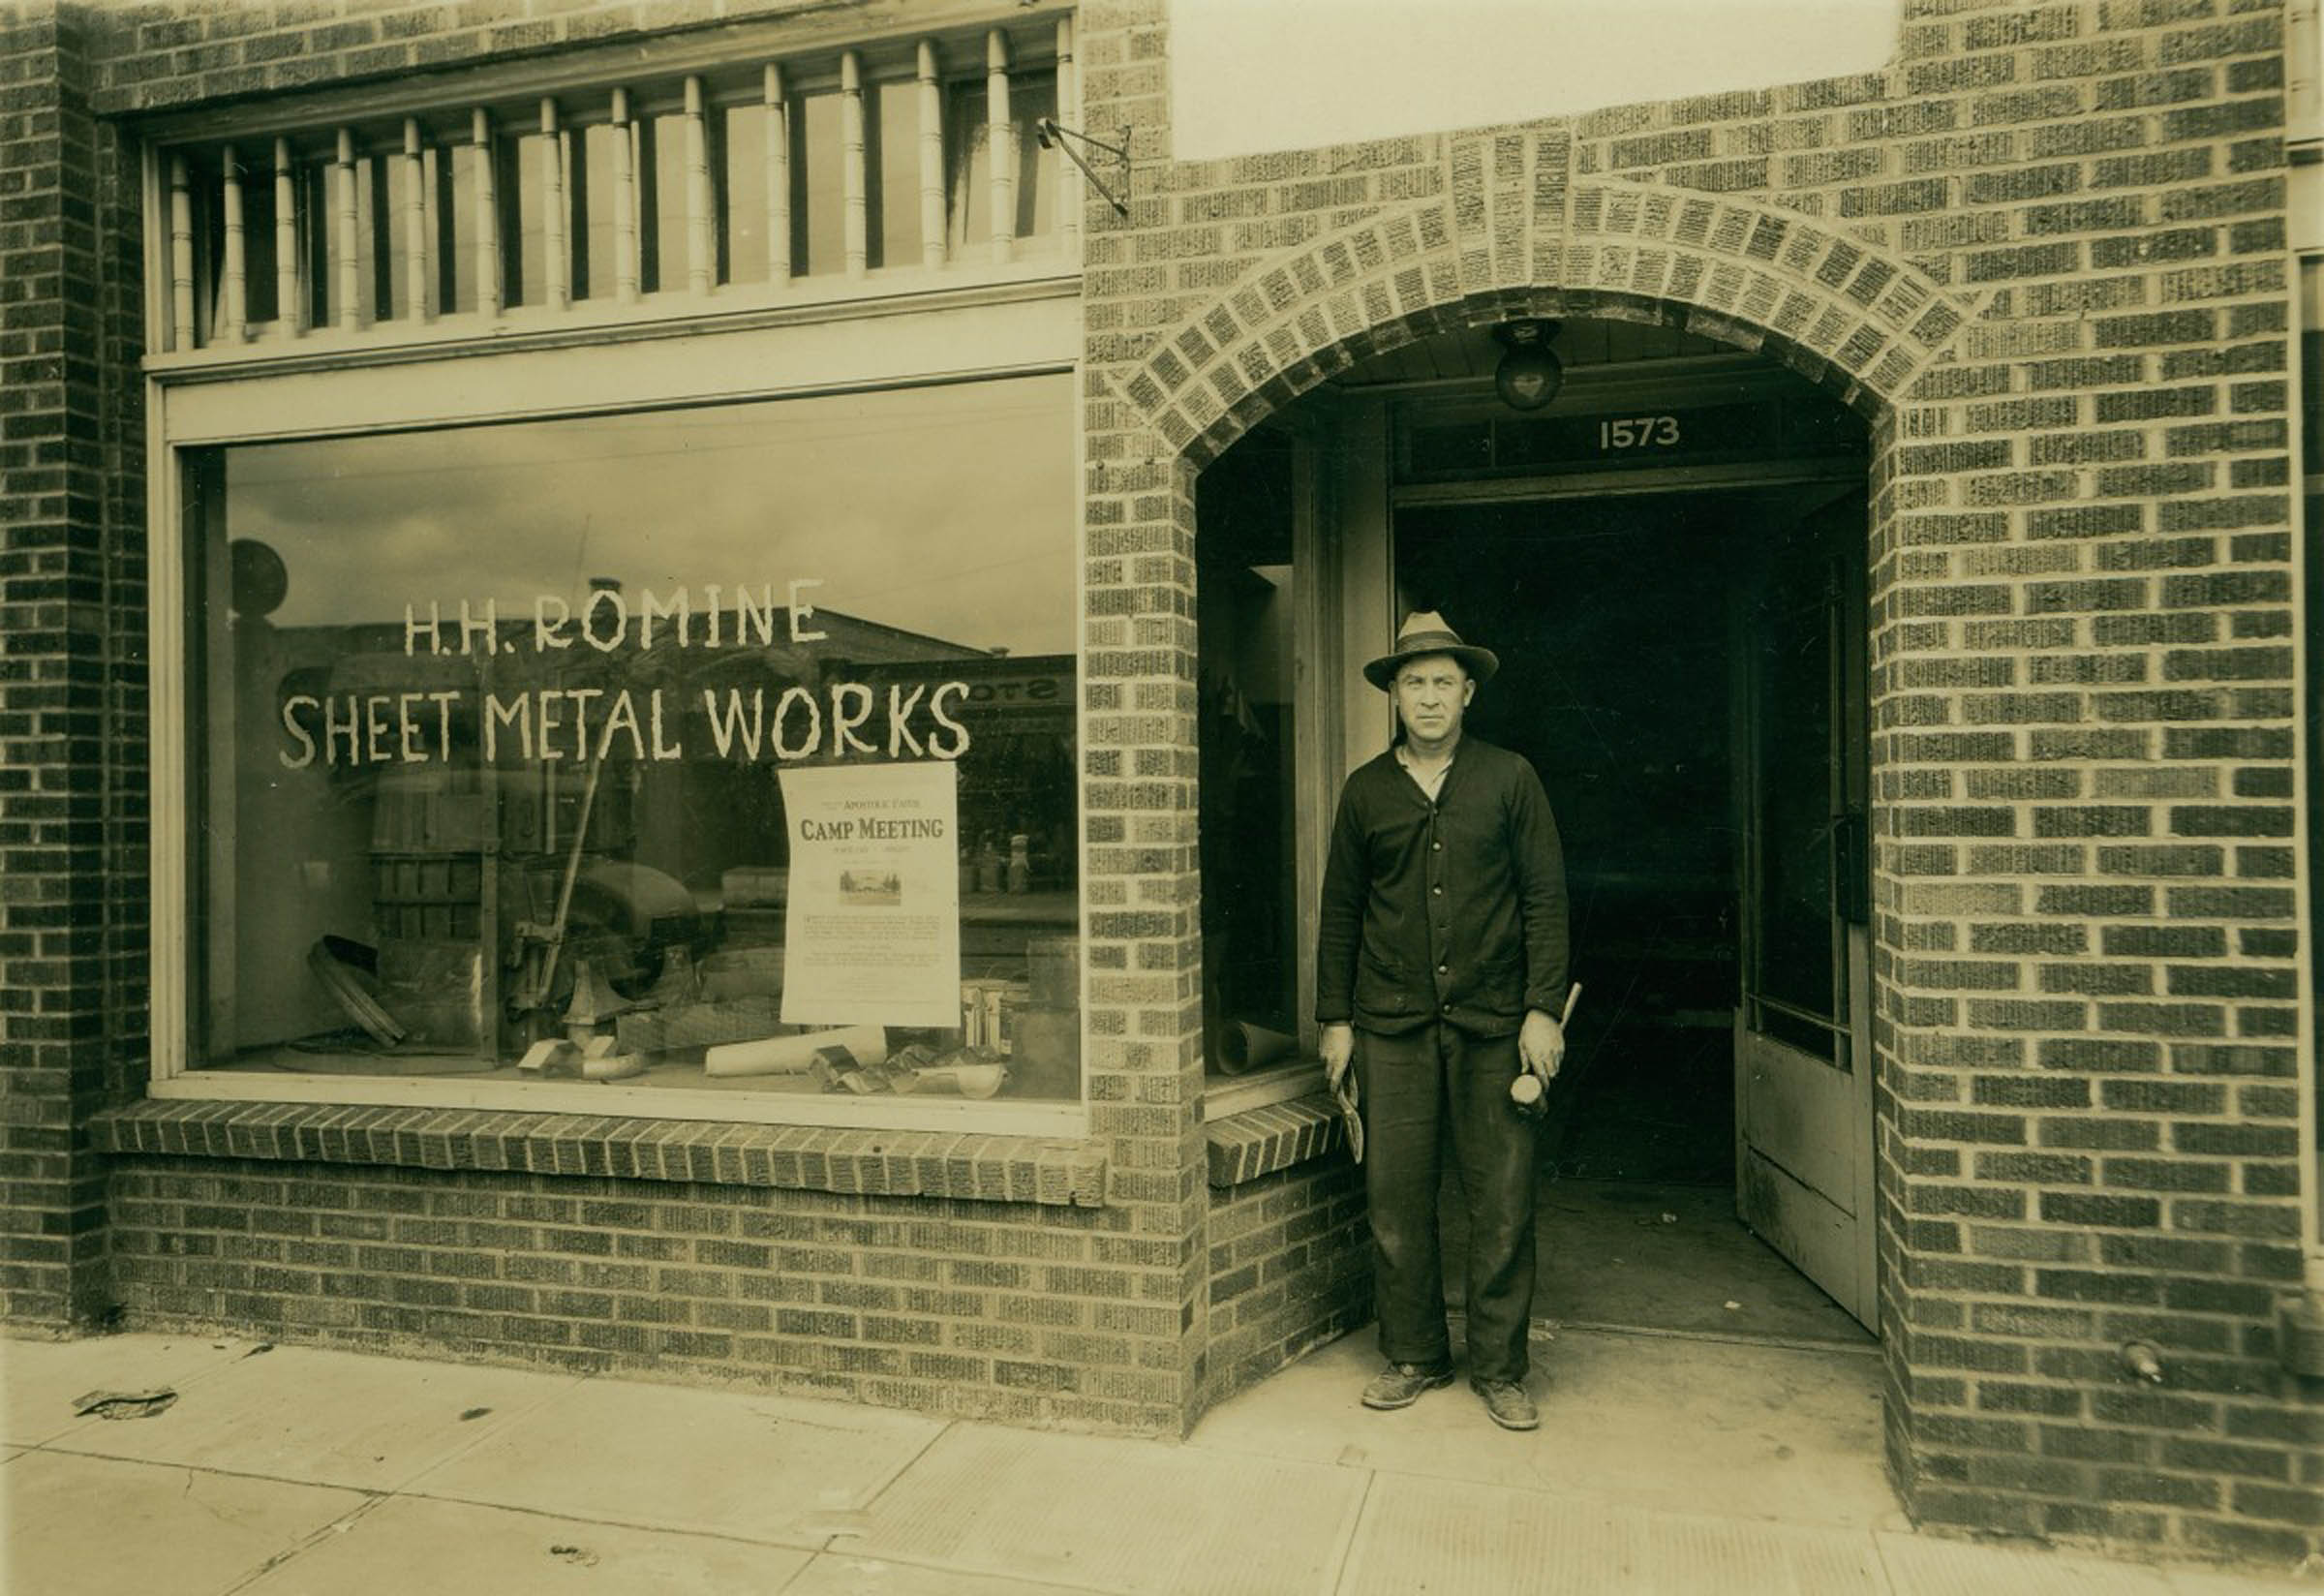 Hh Romine Sheet Metal Works 1931 Vintage Portland